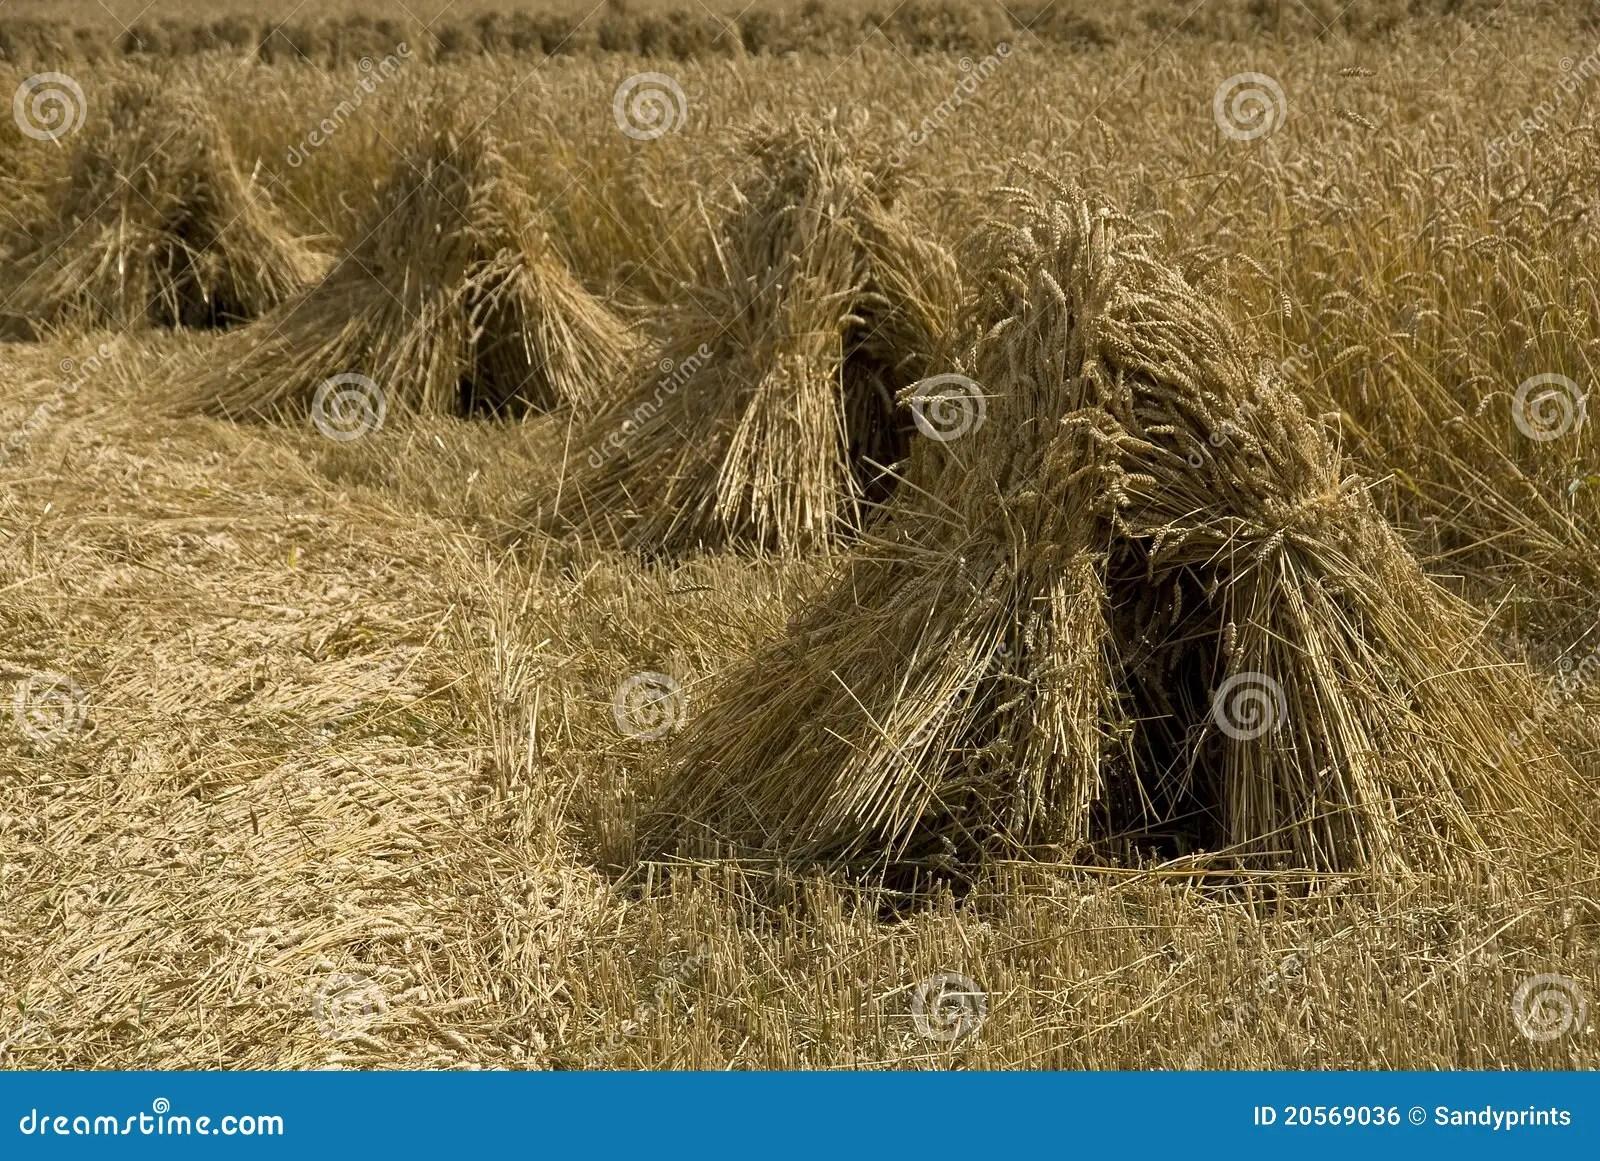 wheat sheaves in a